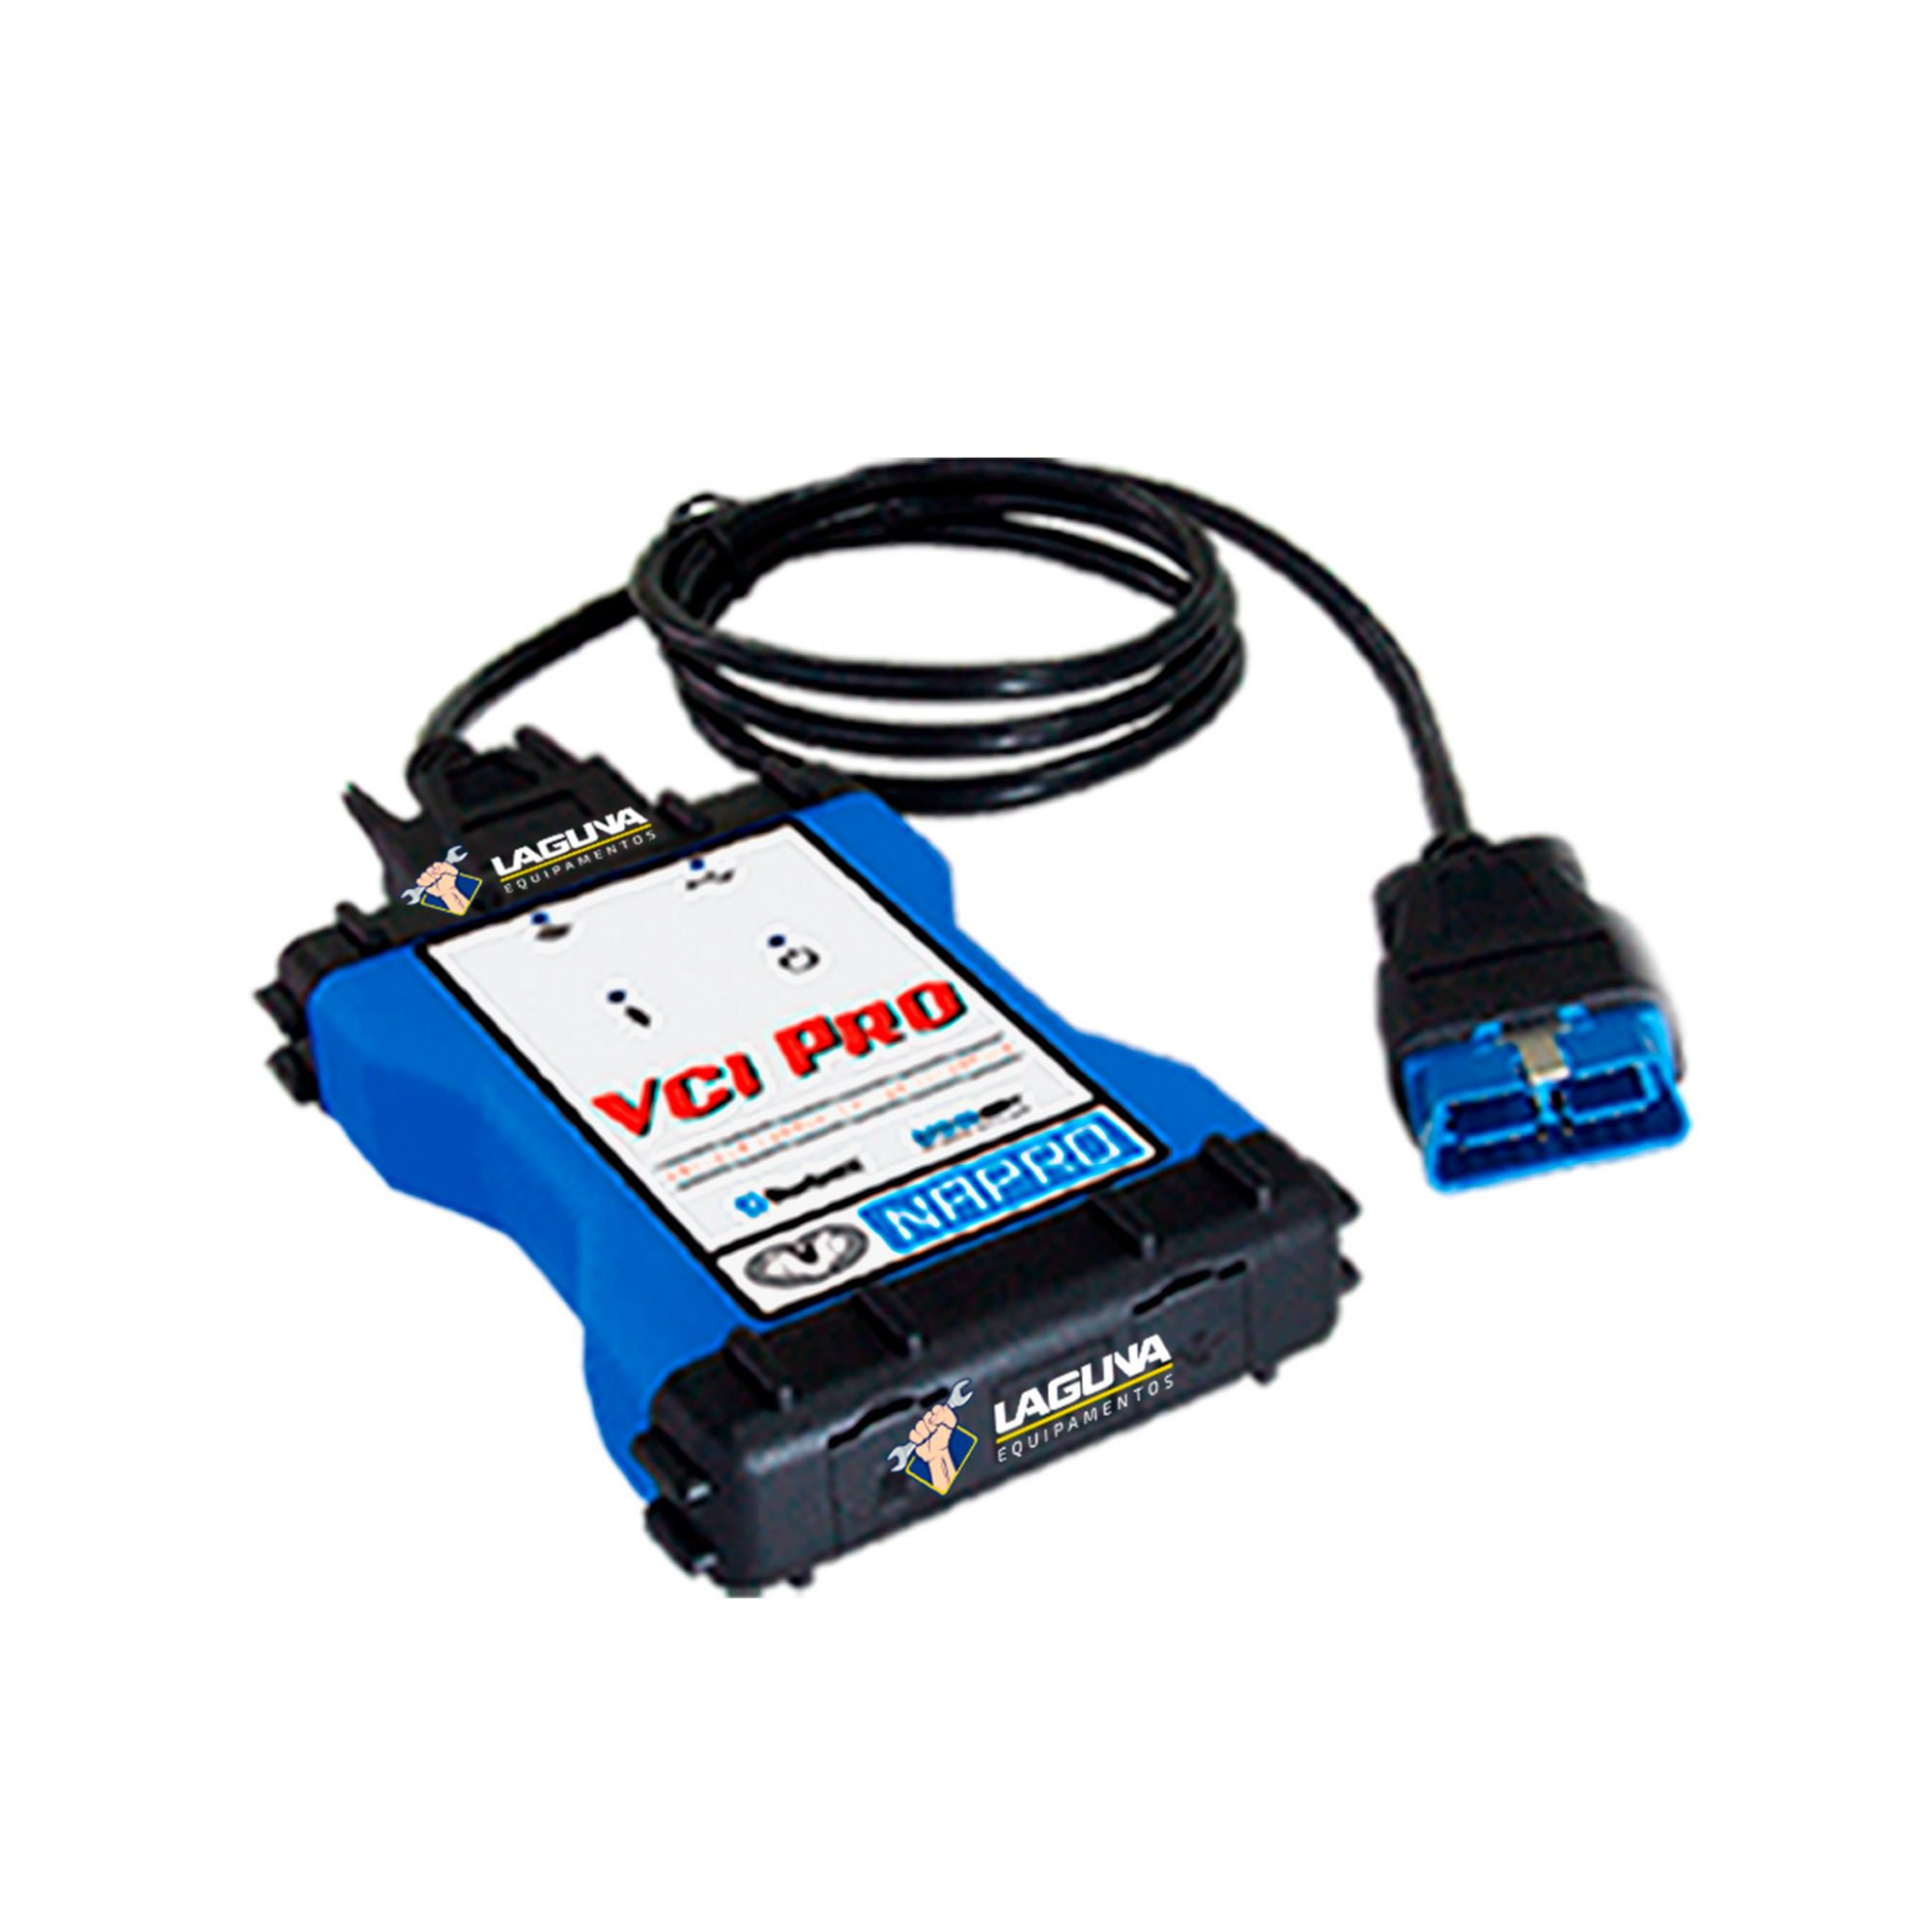 Scanner automotivo PC-SCAN3000FL VCI PRO VERSÃO 21 NAPRO